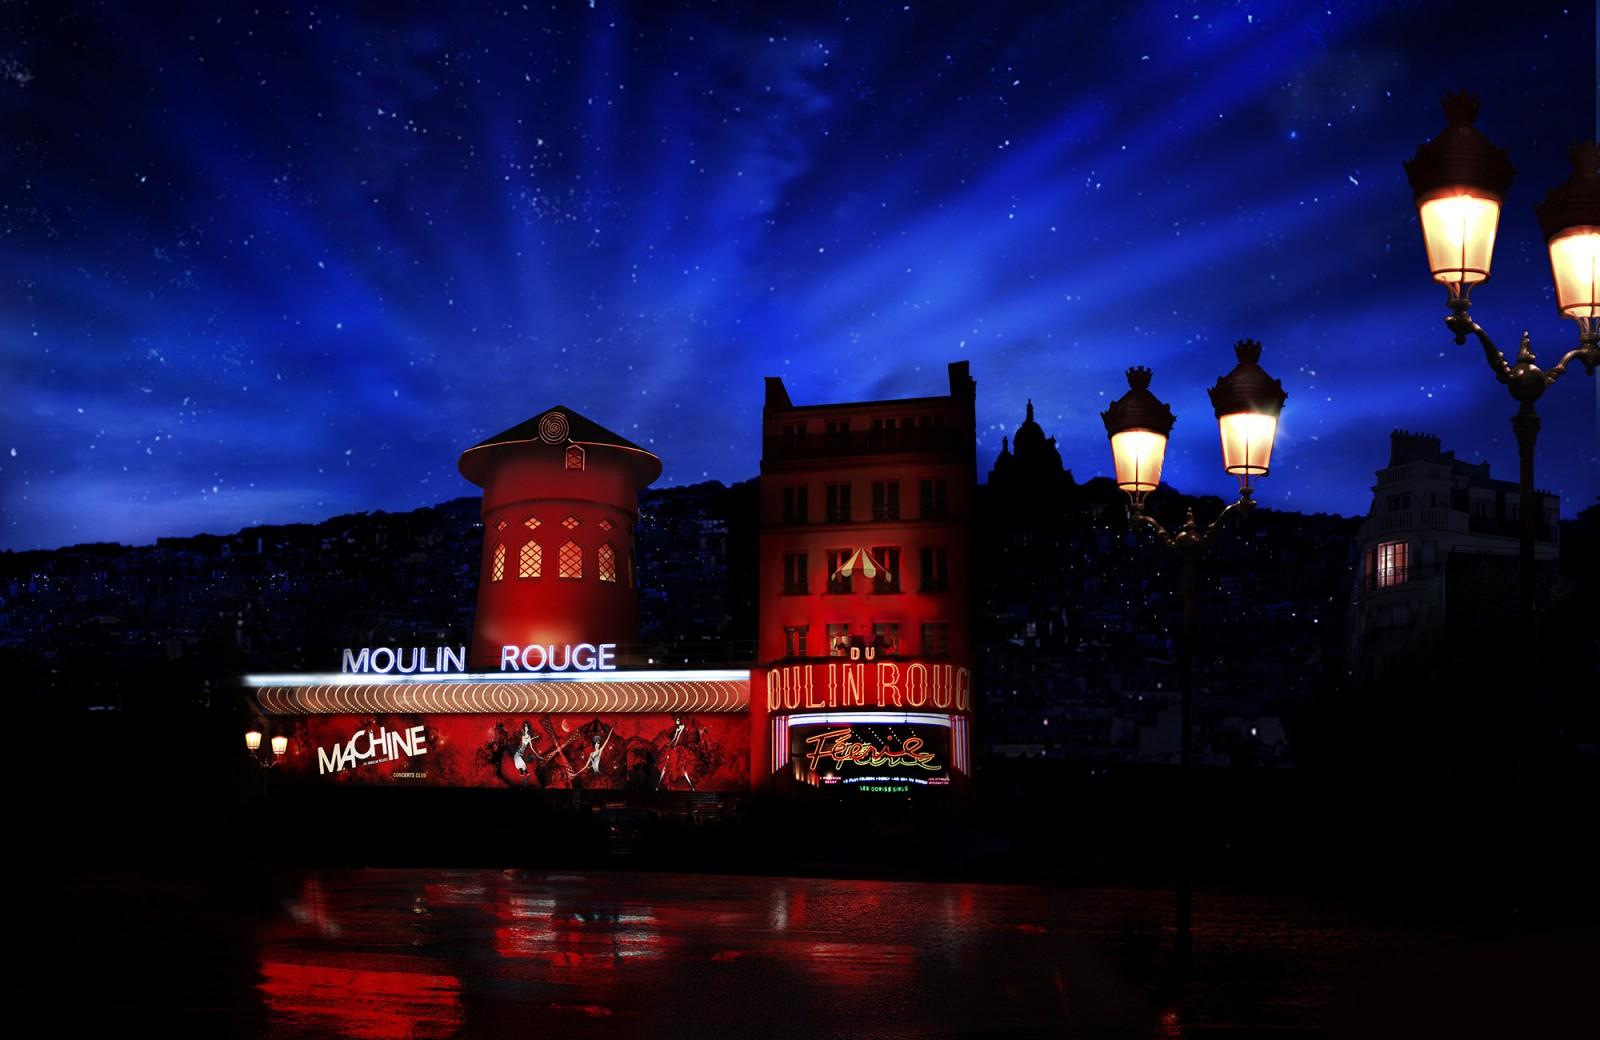 Moulin Rouge z zewnątrz